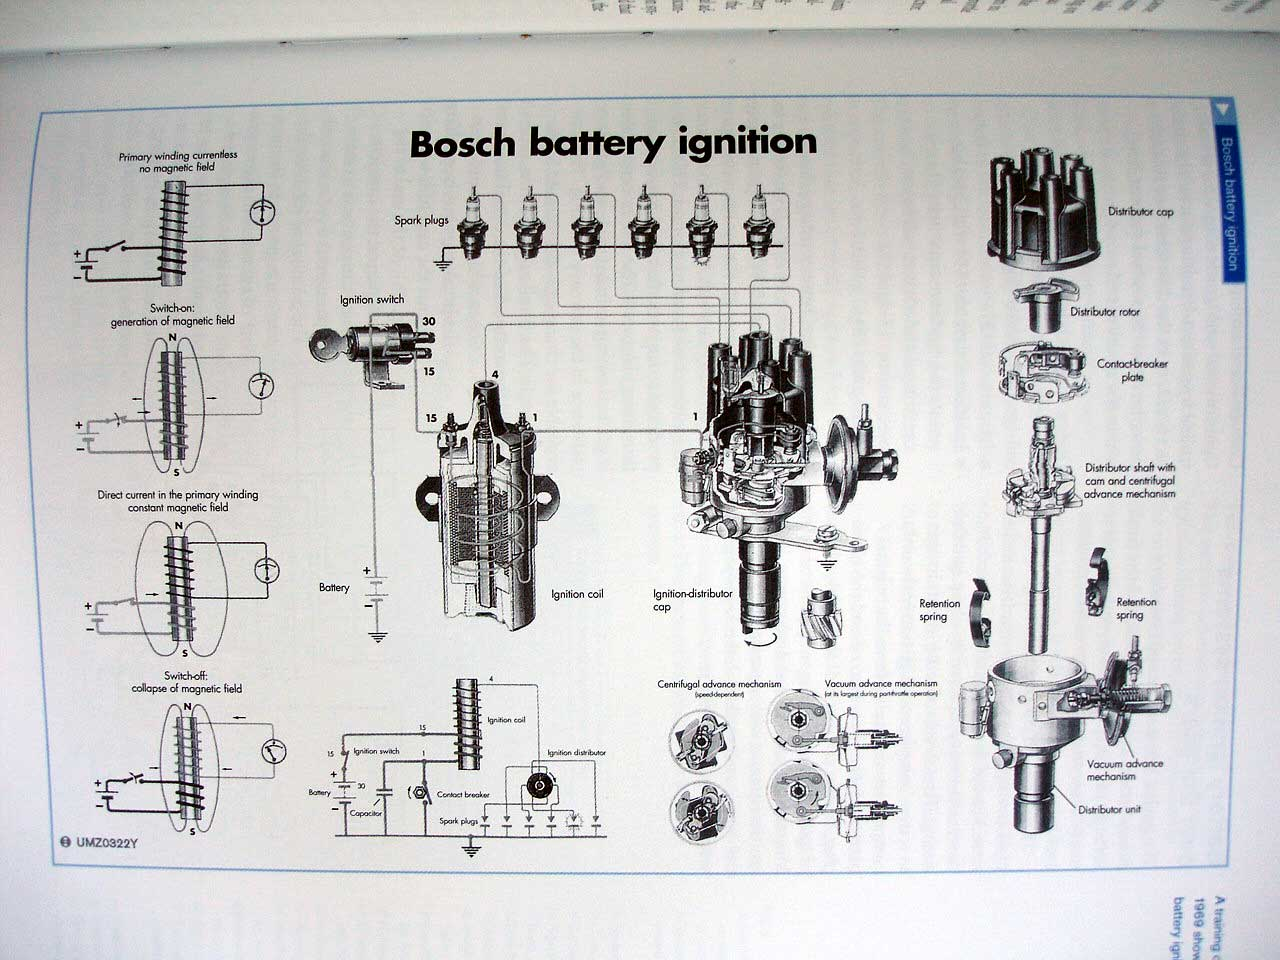 Boschbatteryignition on Ultima Motor Wiring Diagram